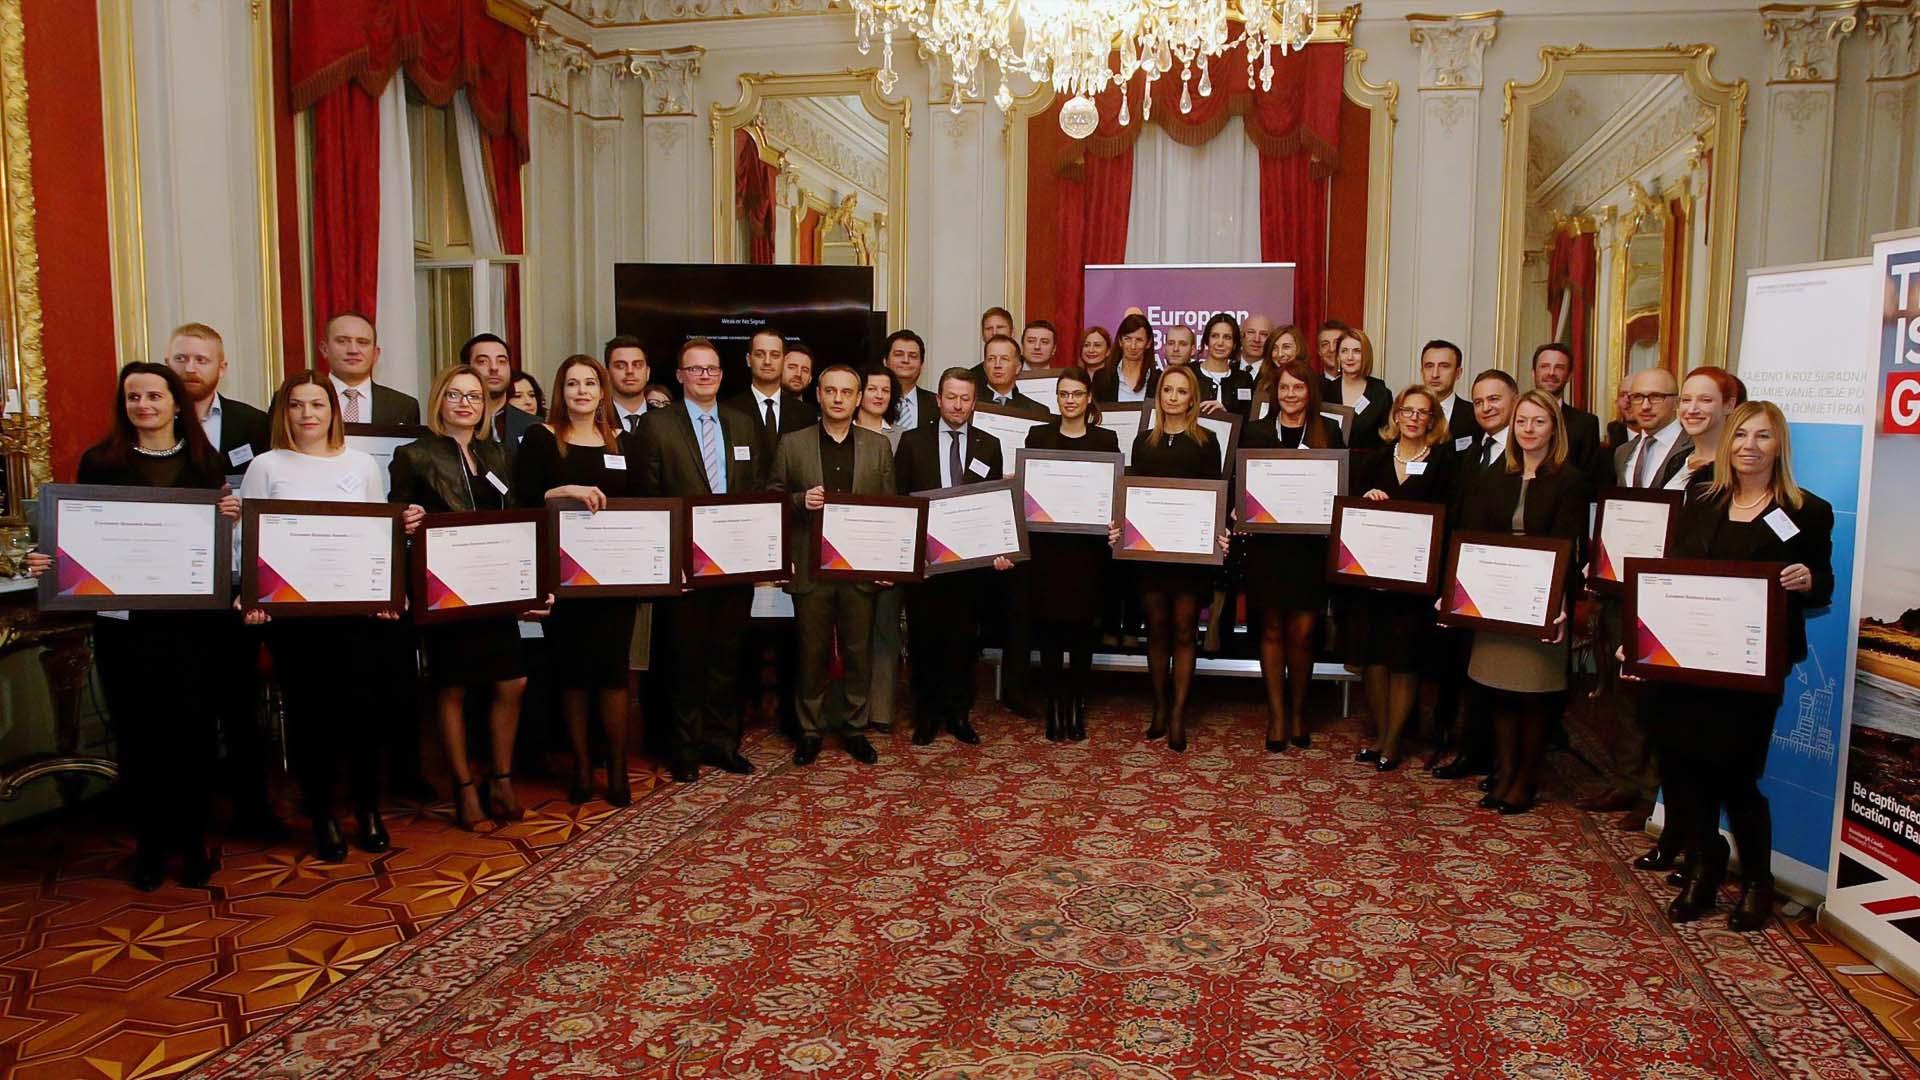 Specijalna bolnica Sv. Katarina nadomak prestižne europske nagrade